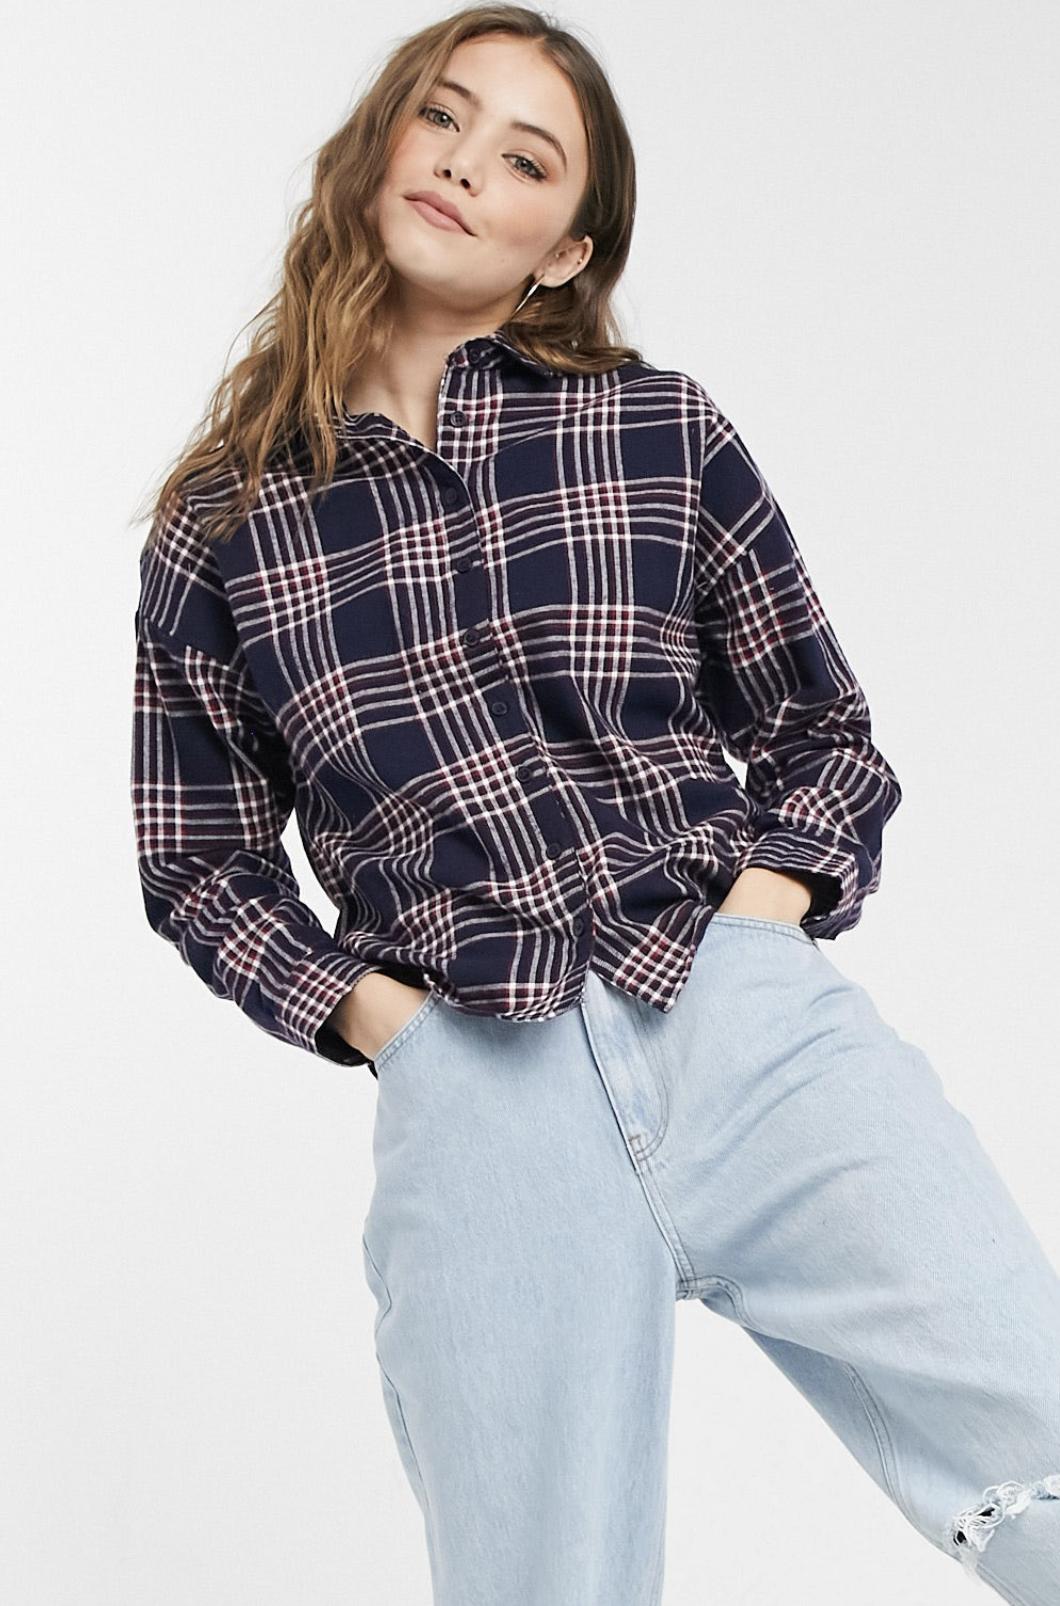 Camisa a cuadros vintage de Wednesday's Girl